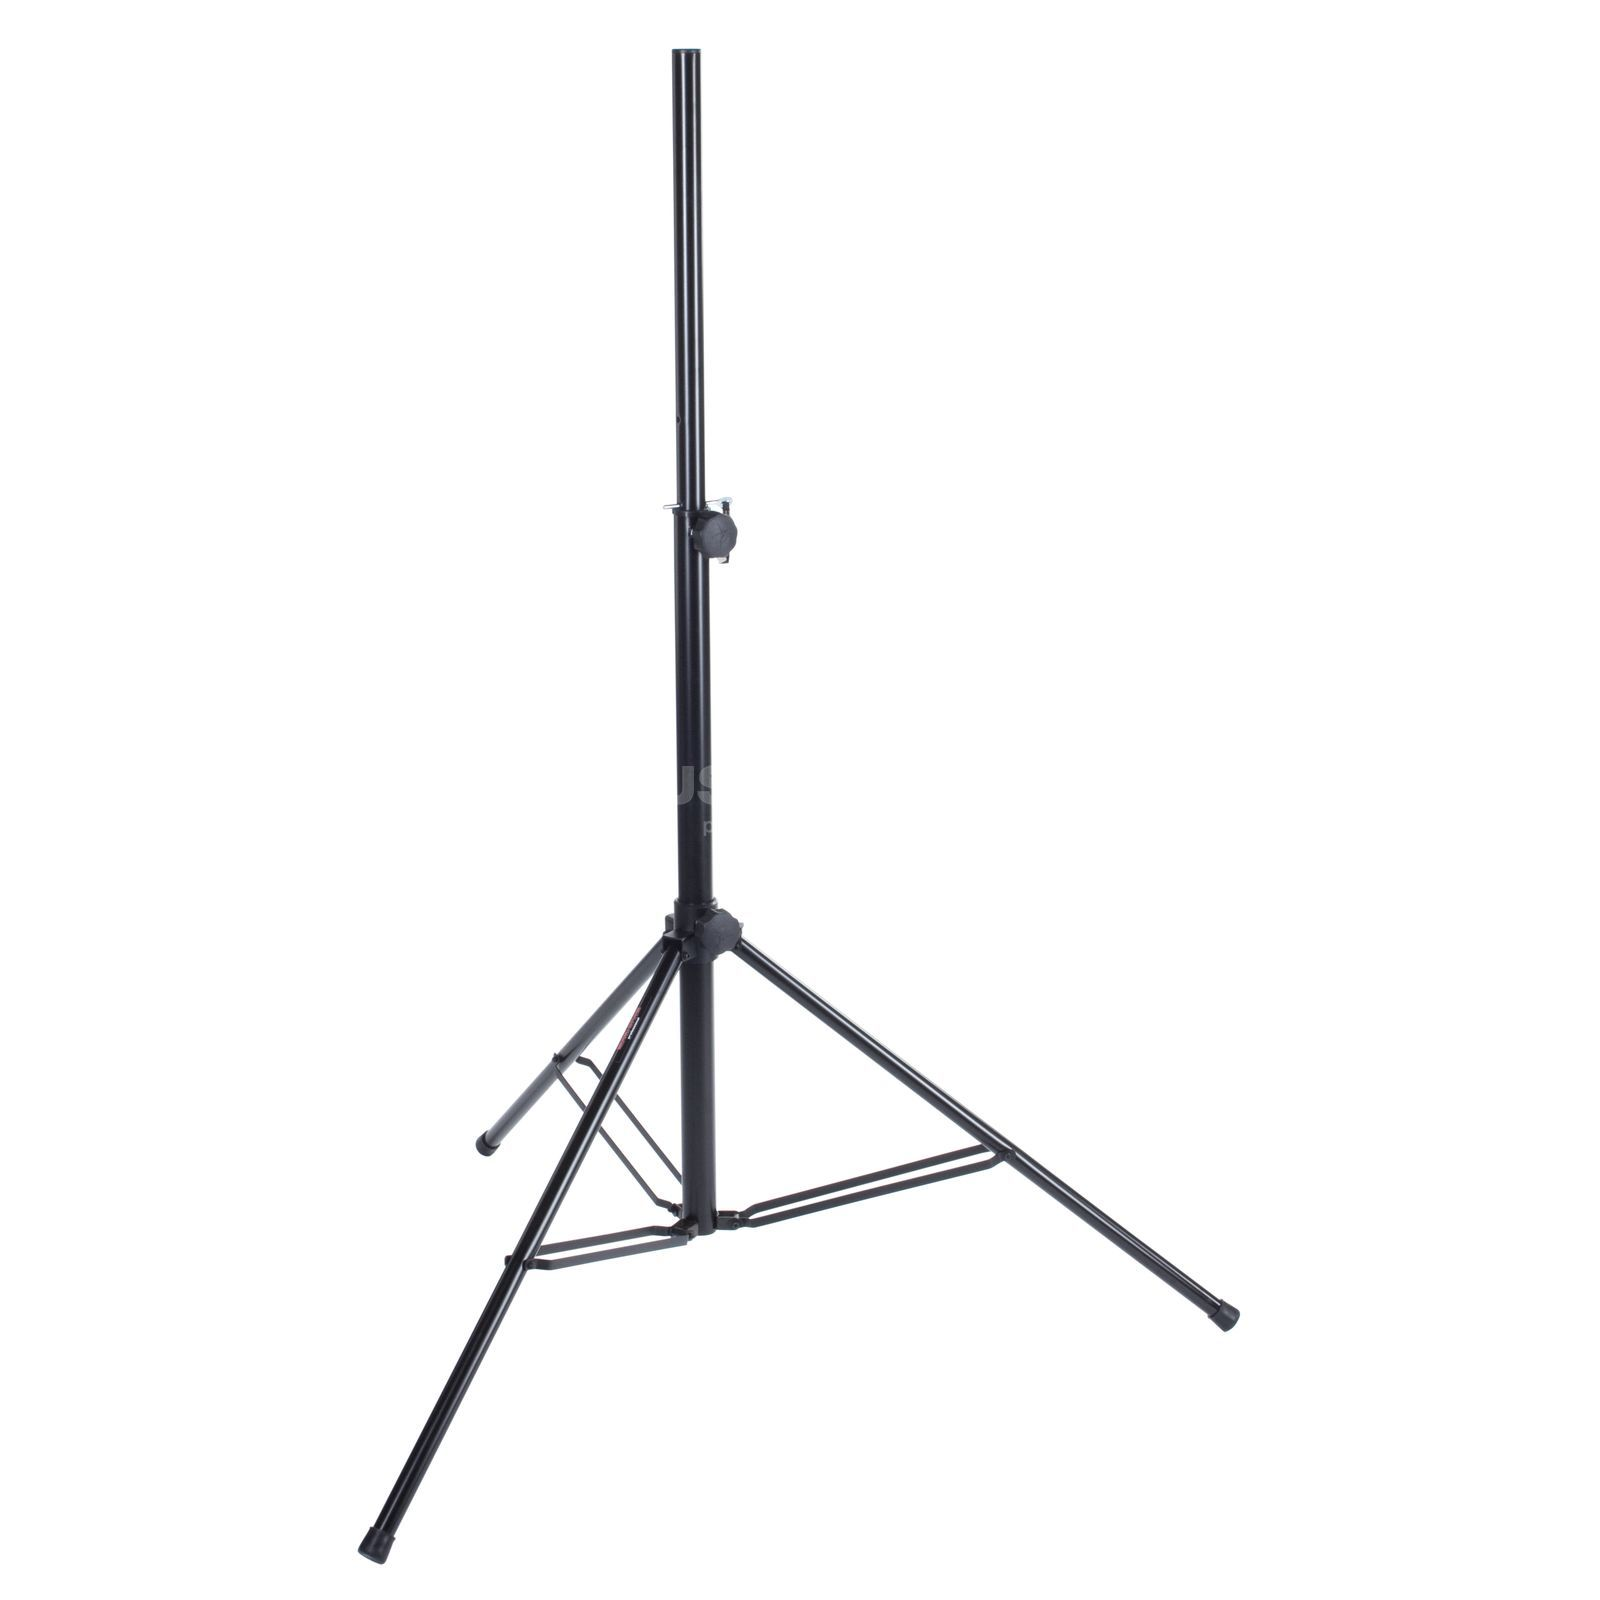 Music store box 3 soporte de acero para altavoces 40kg - Soporte de altavoces ...